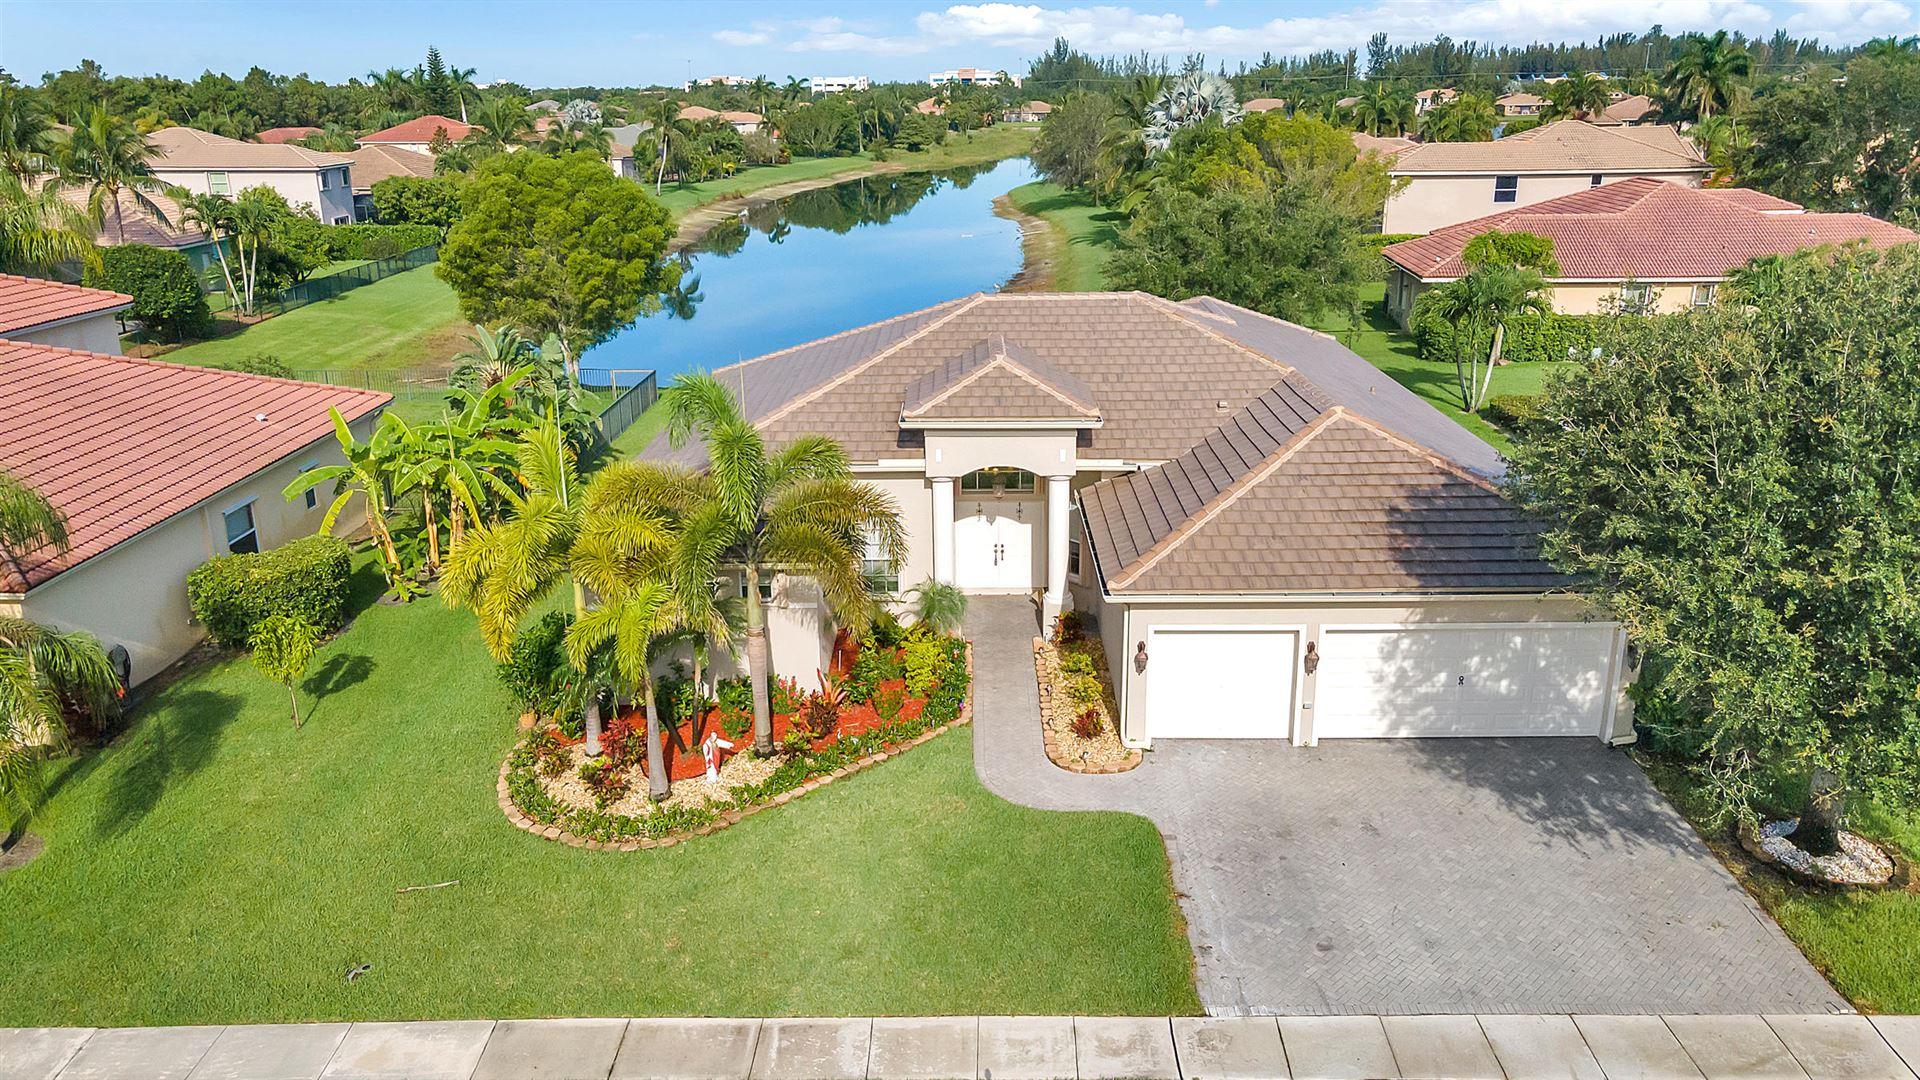 1687 Newhaven Point Lane, West Palm Beach, FL 33411 - #: RX-10728806